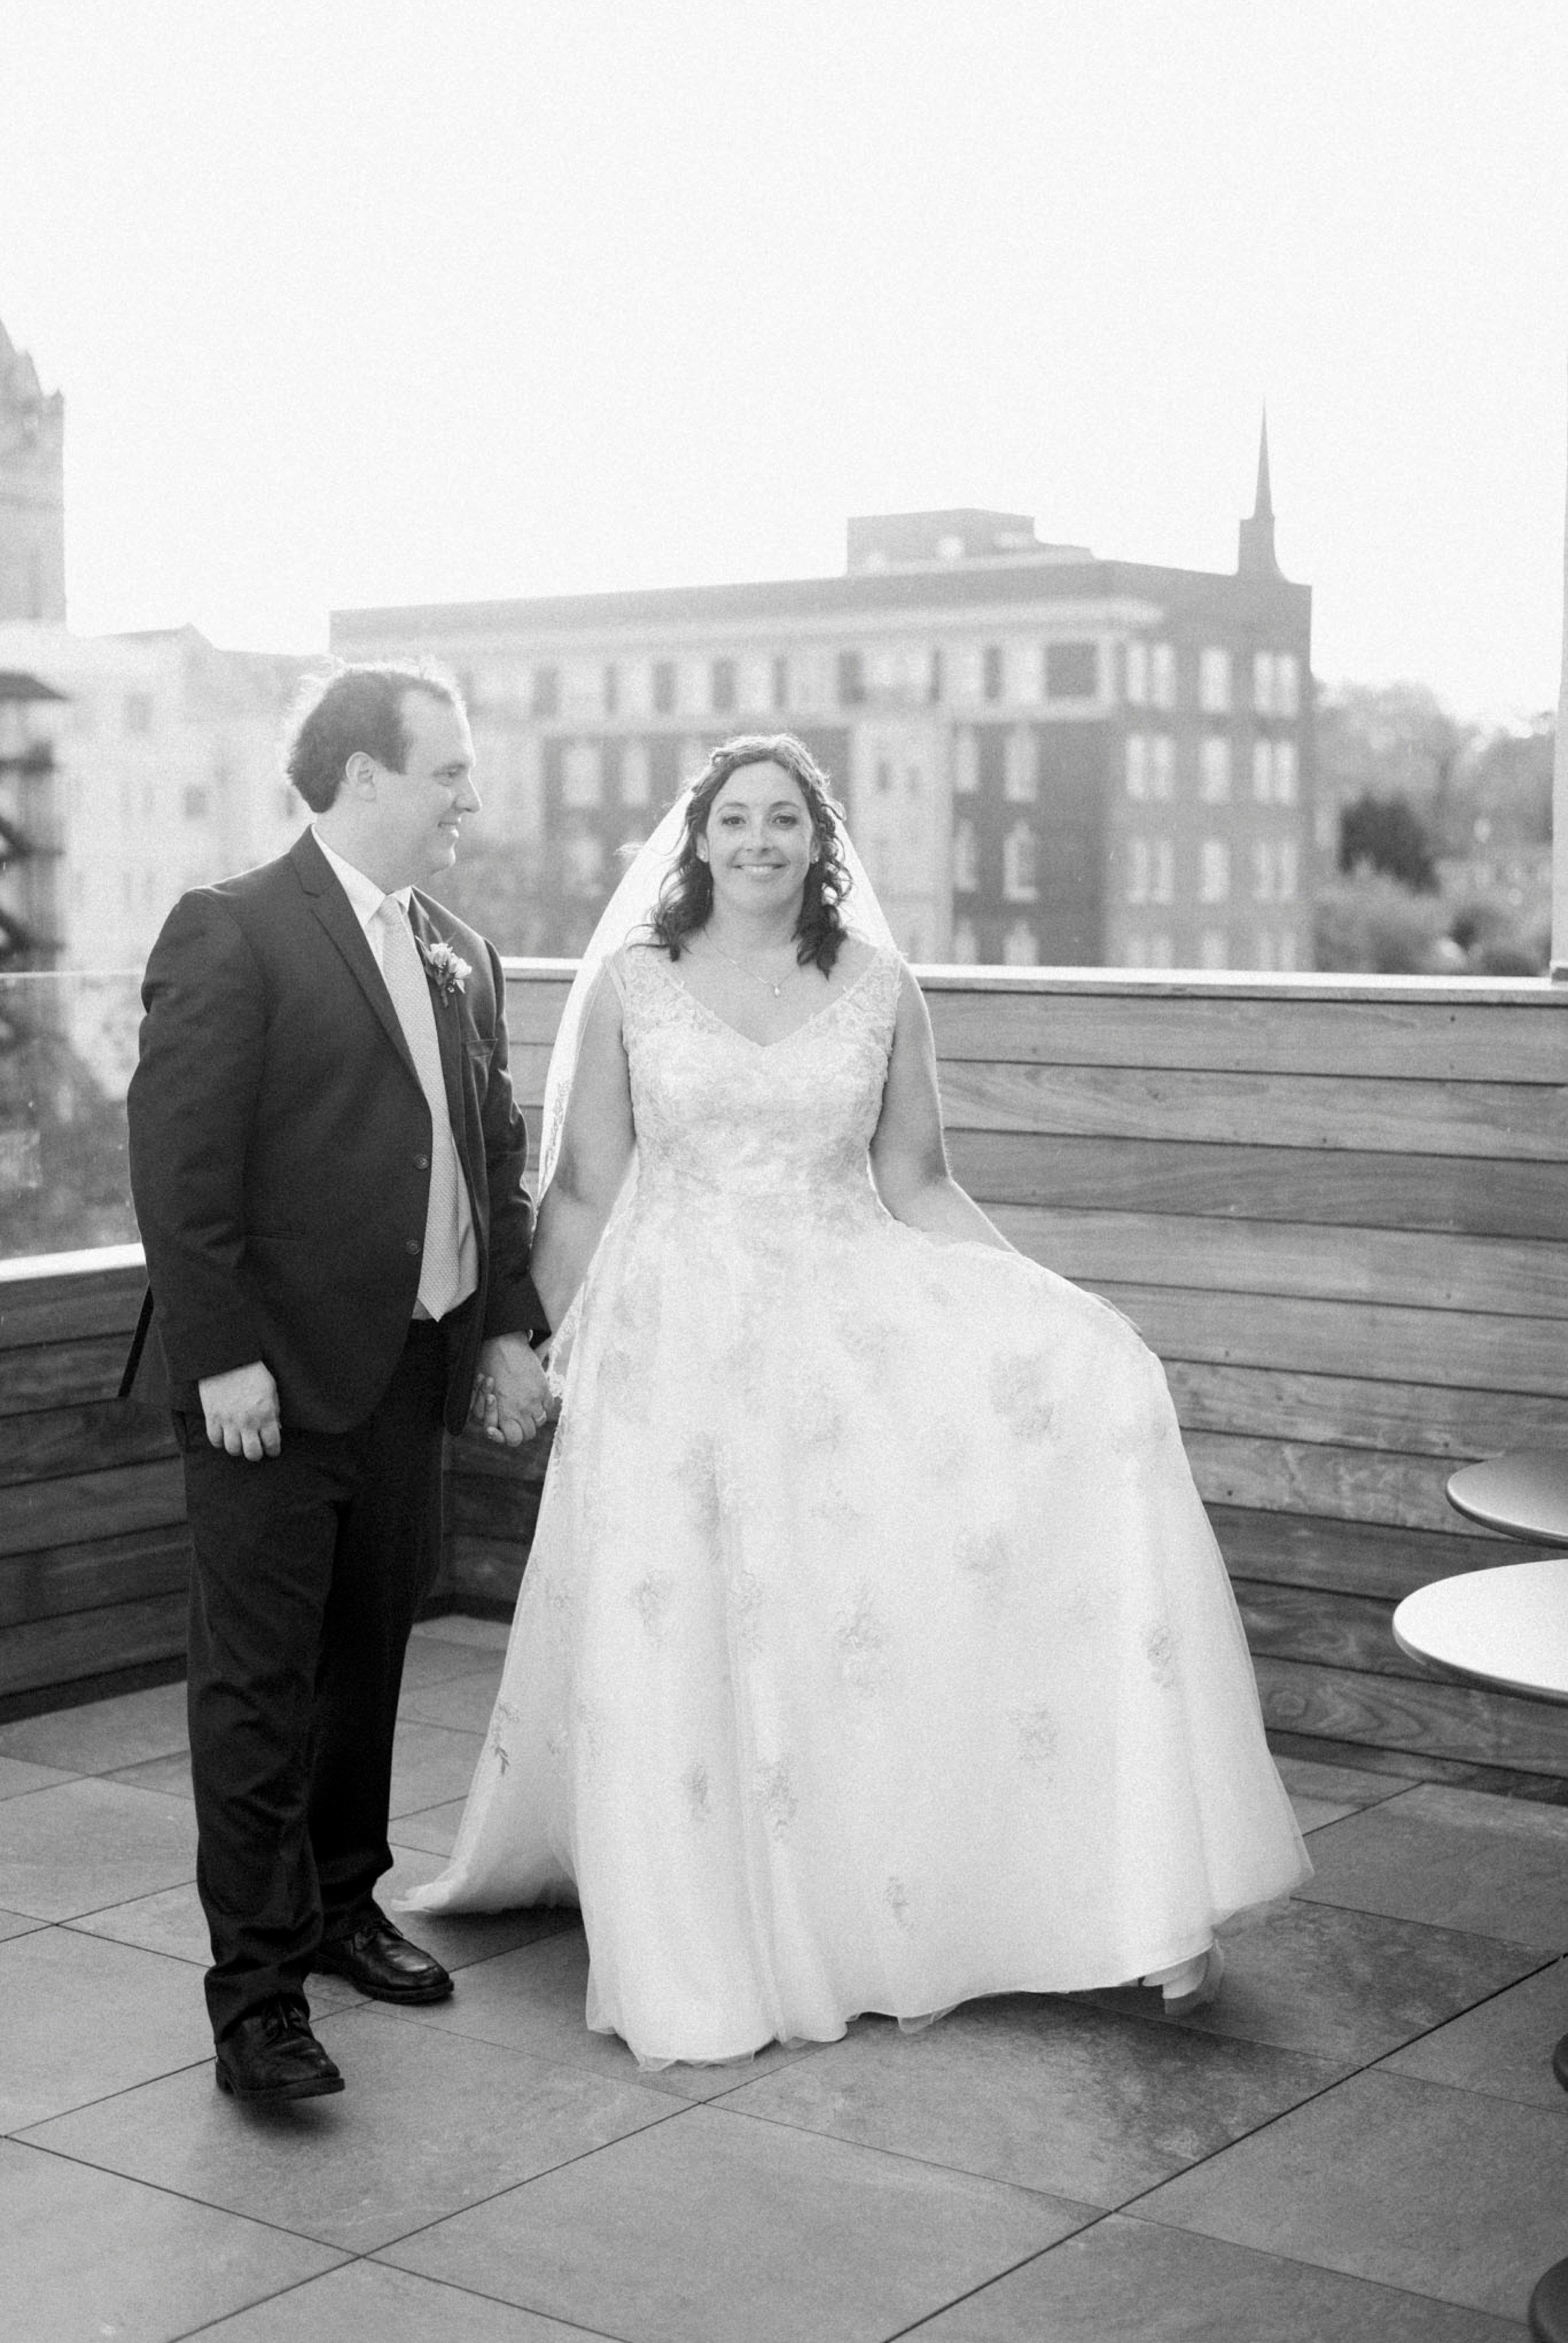 TheVirginianHotel_LynchburgVA_TheVirginianHotelWedding_Virginiaweddingphotographer_Lynchburgvawedding 48.jpg